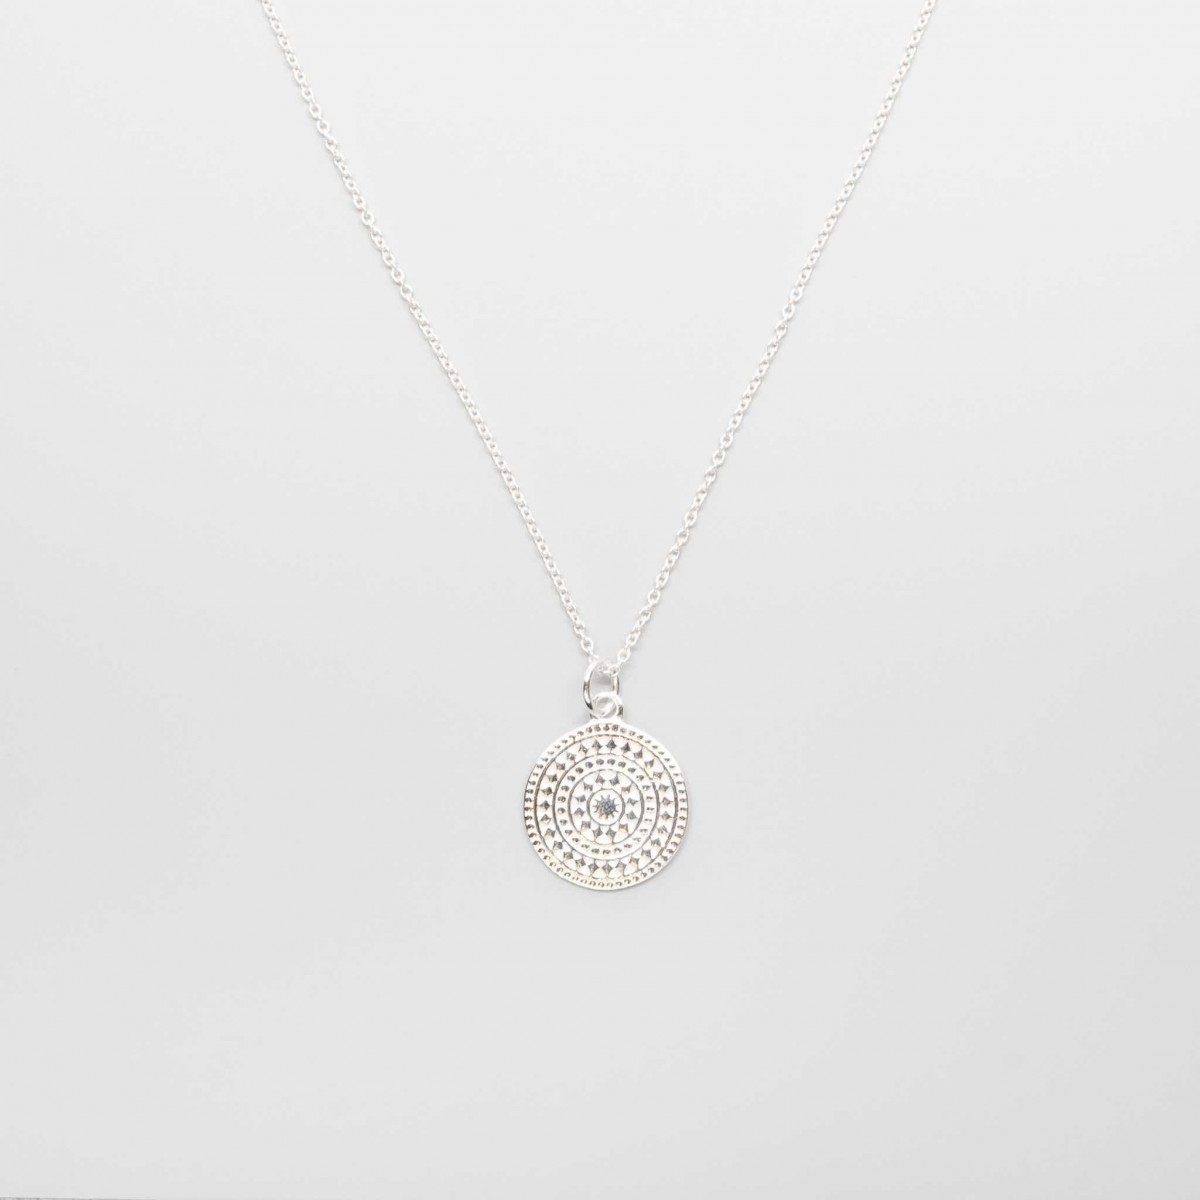 fejn jewelry - Ornament Necklace Silber